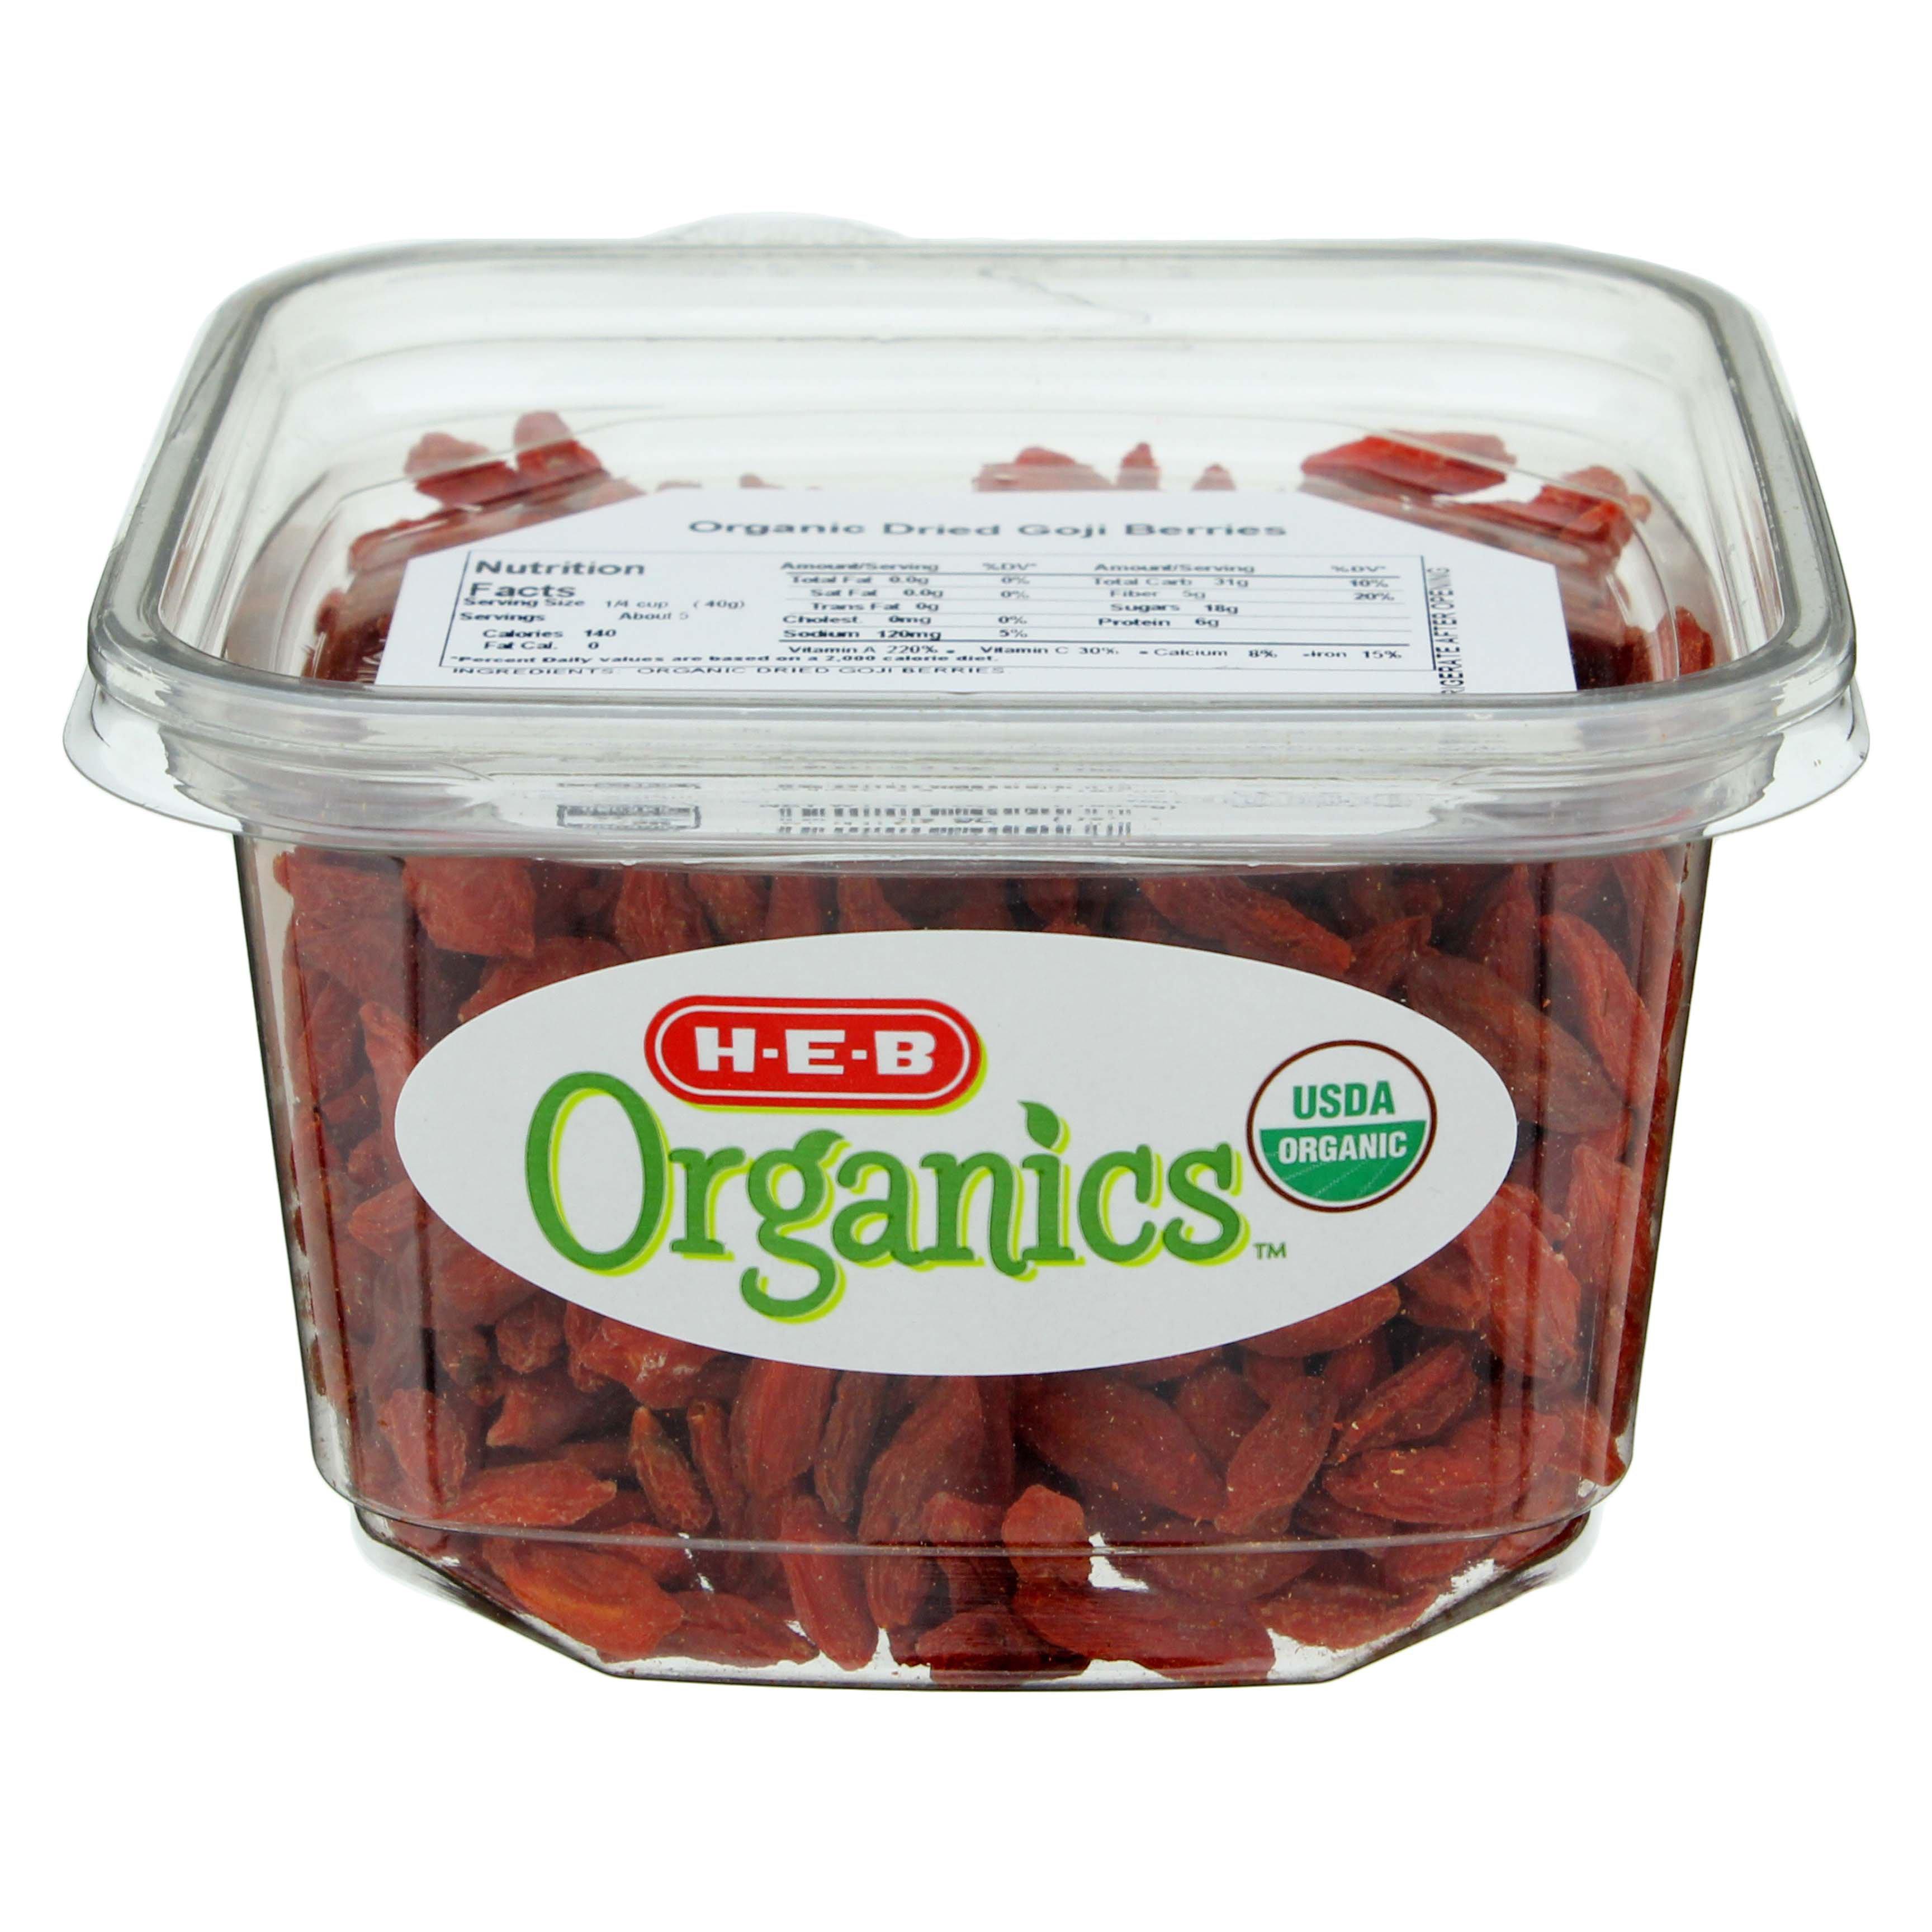 H-E-B Organics Goji Berries - Shop Fruit at H-E-B